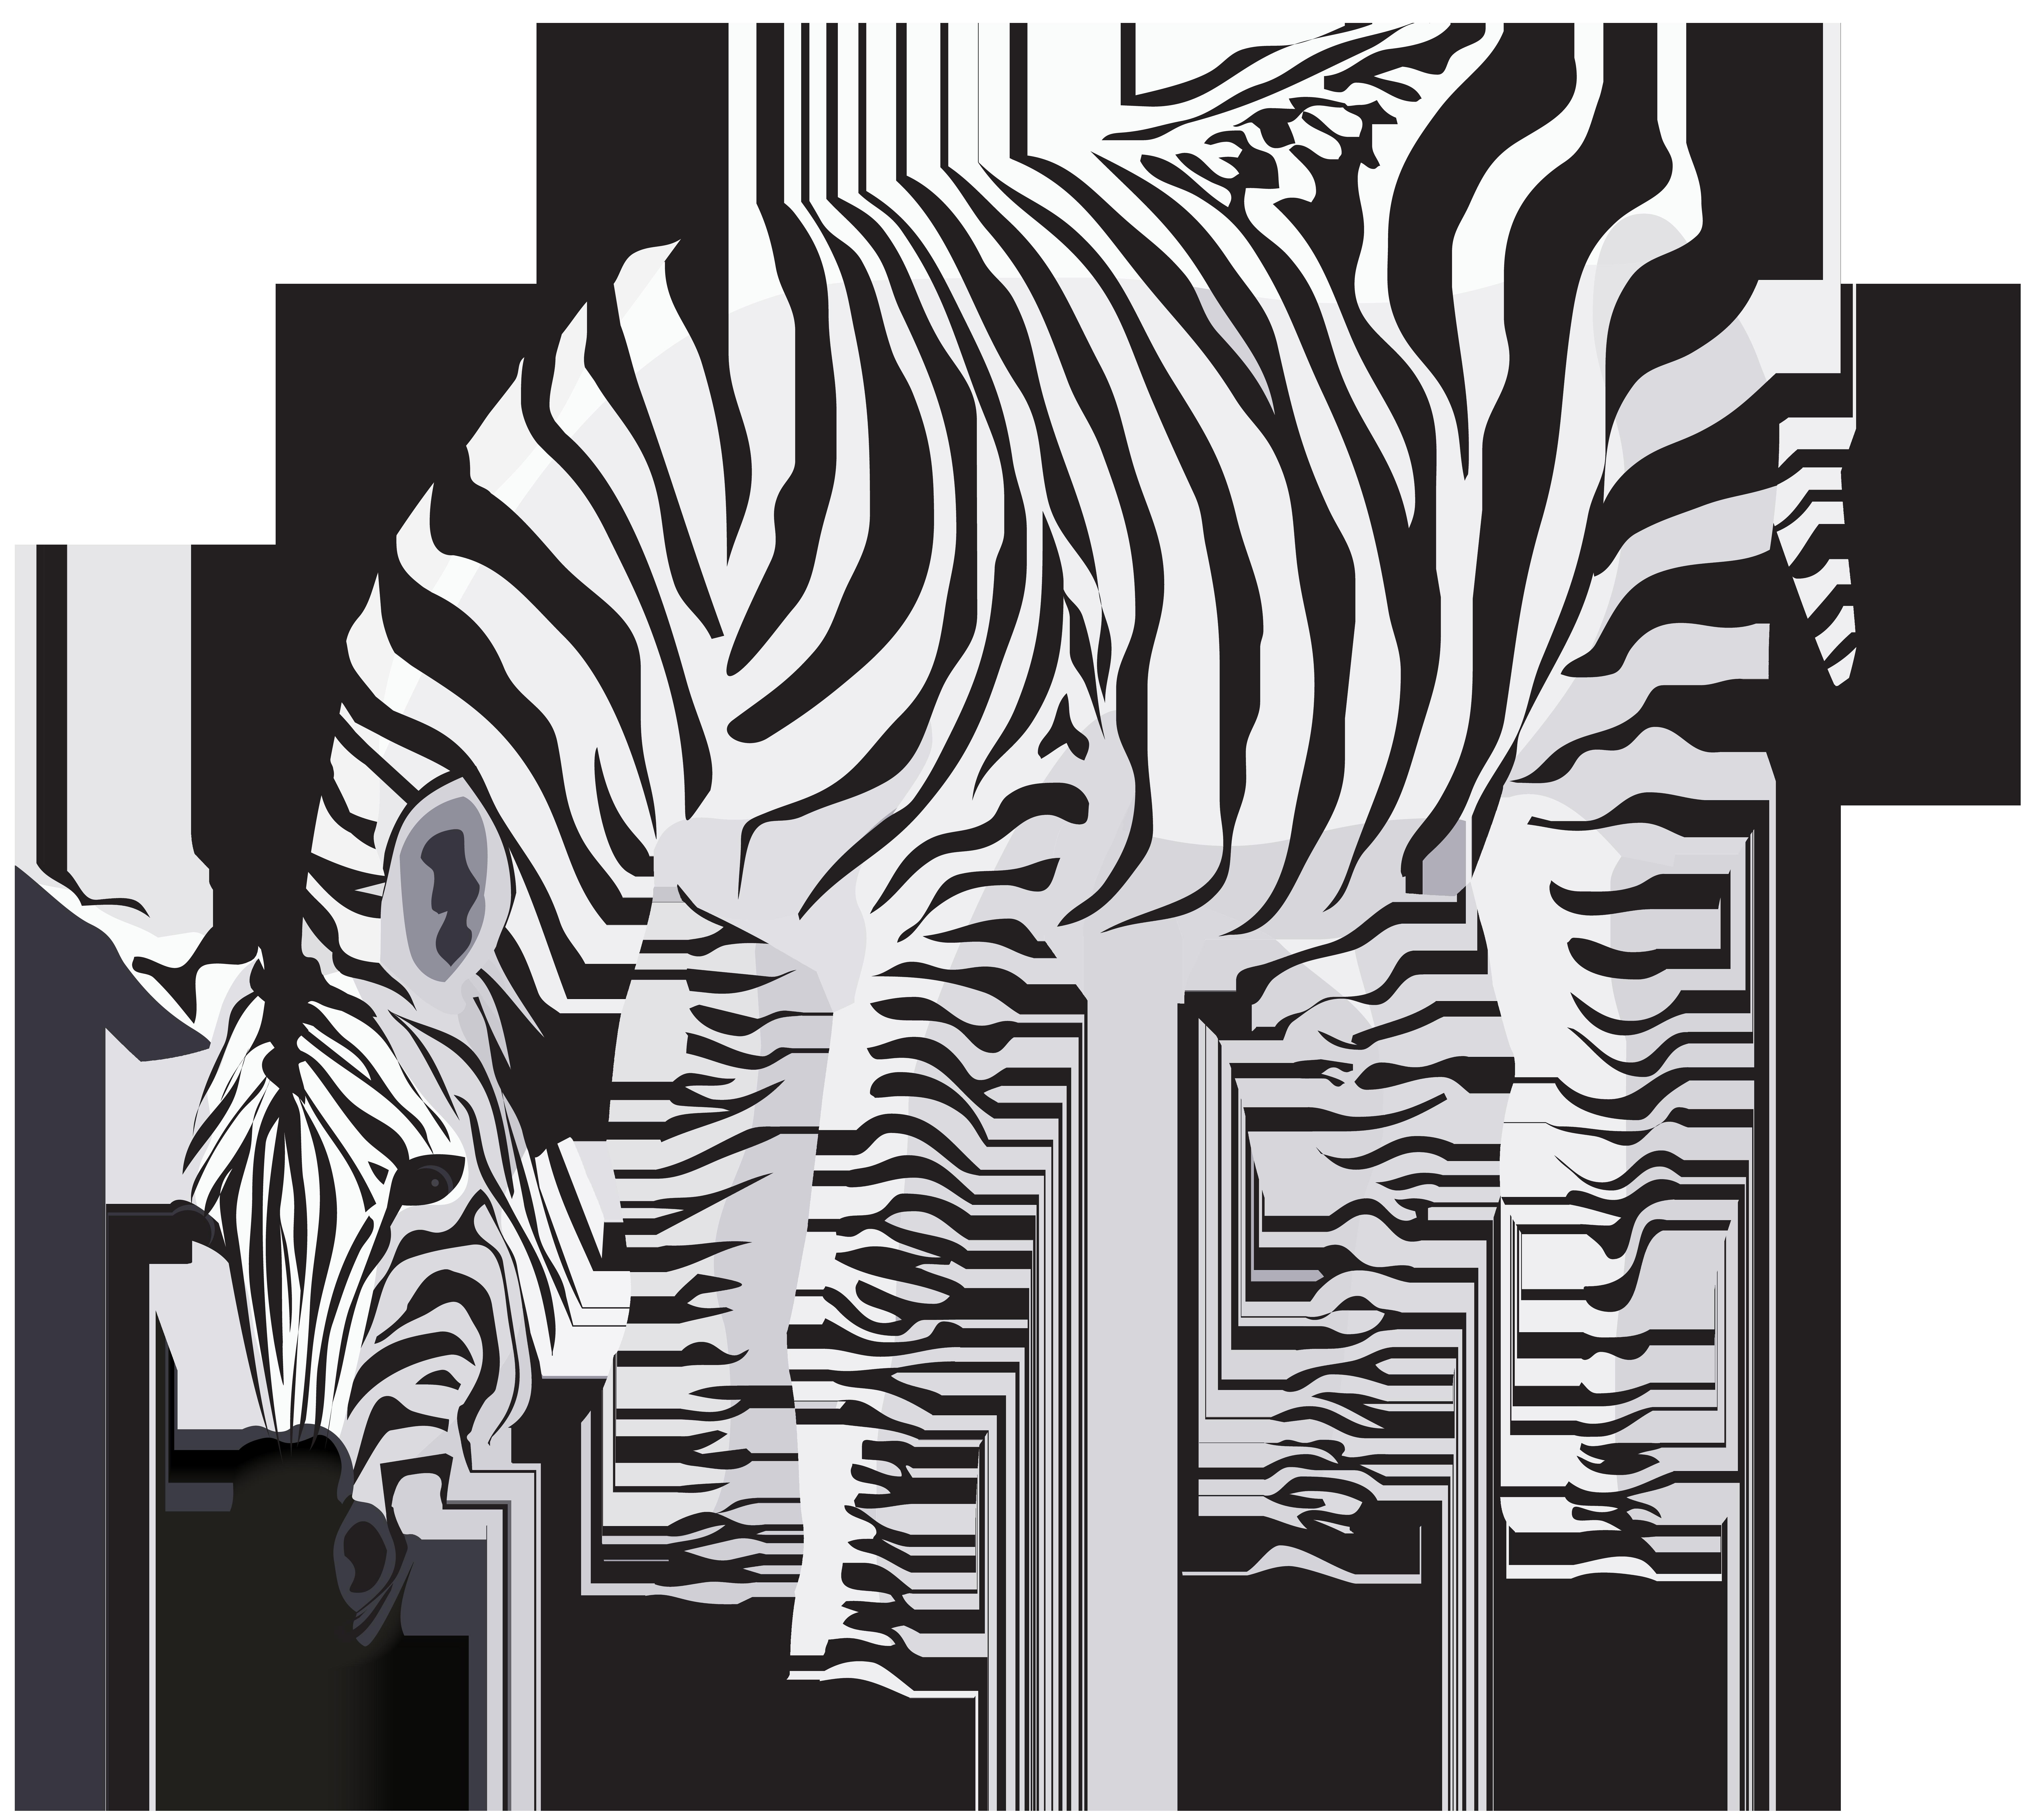 Image gallery yopriceville high. Clipart zebra zebra bow